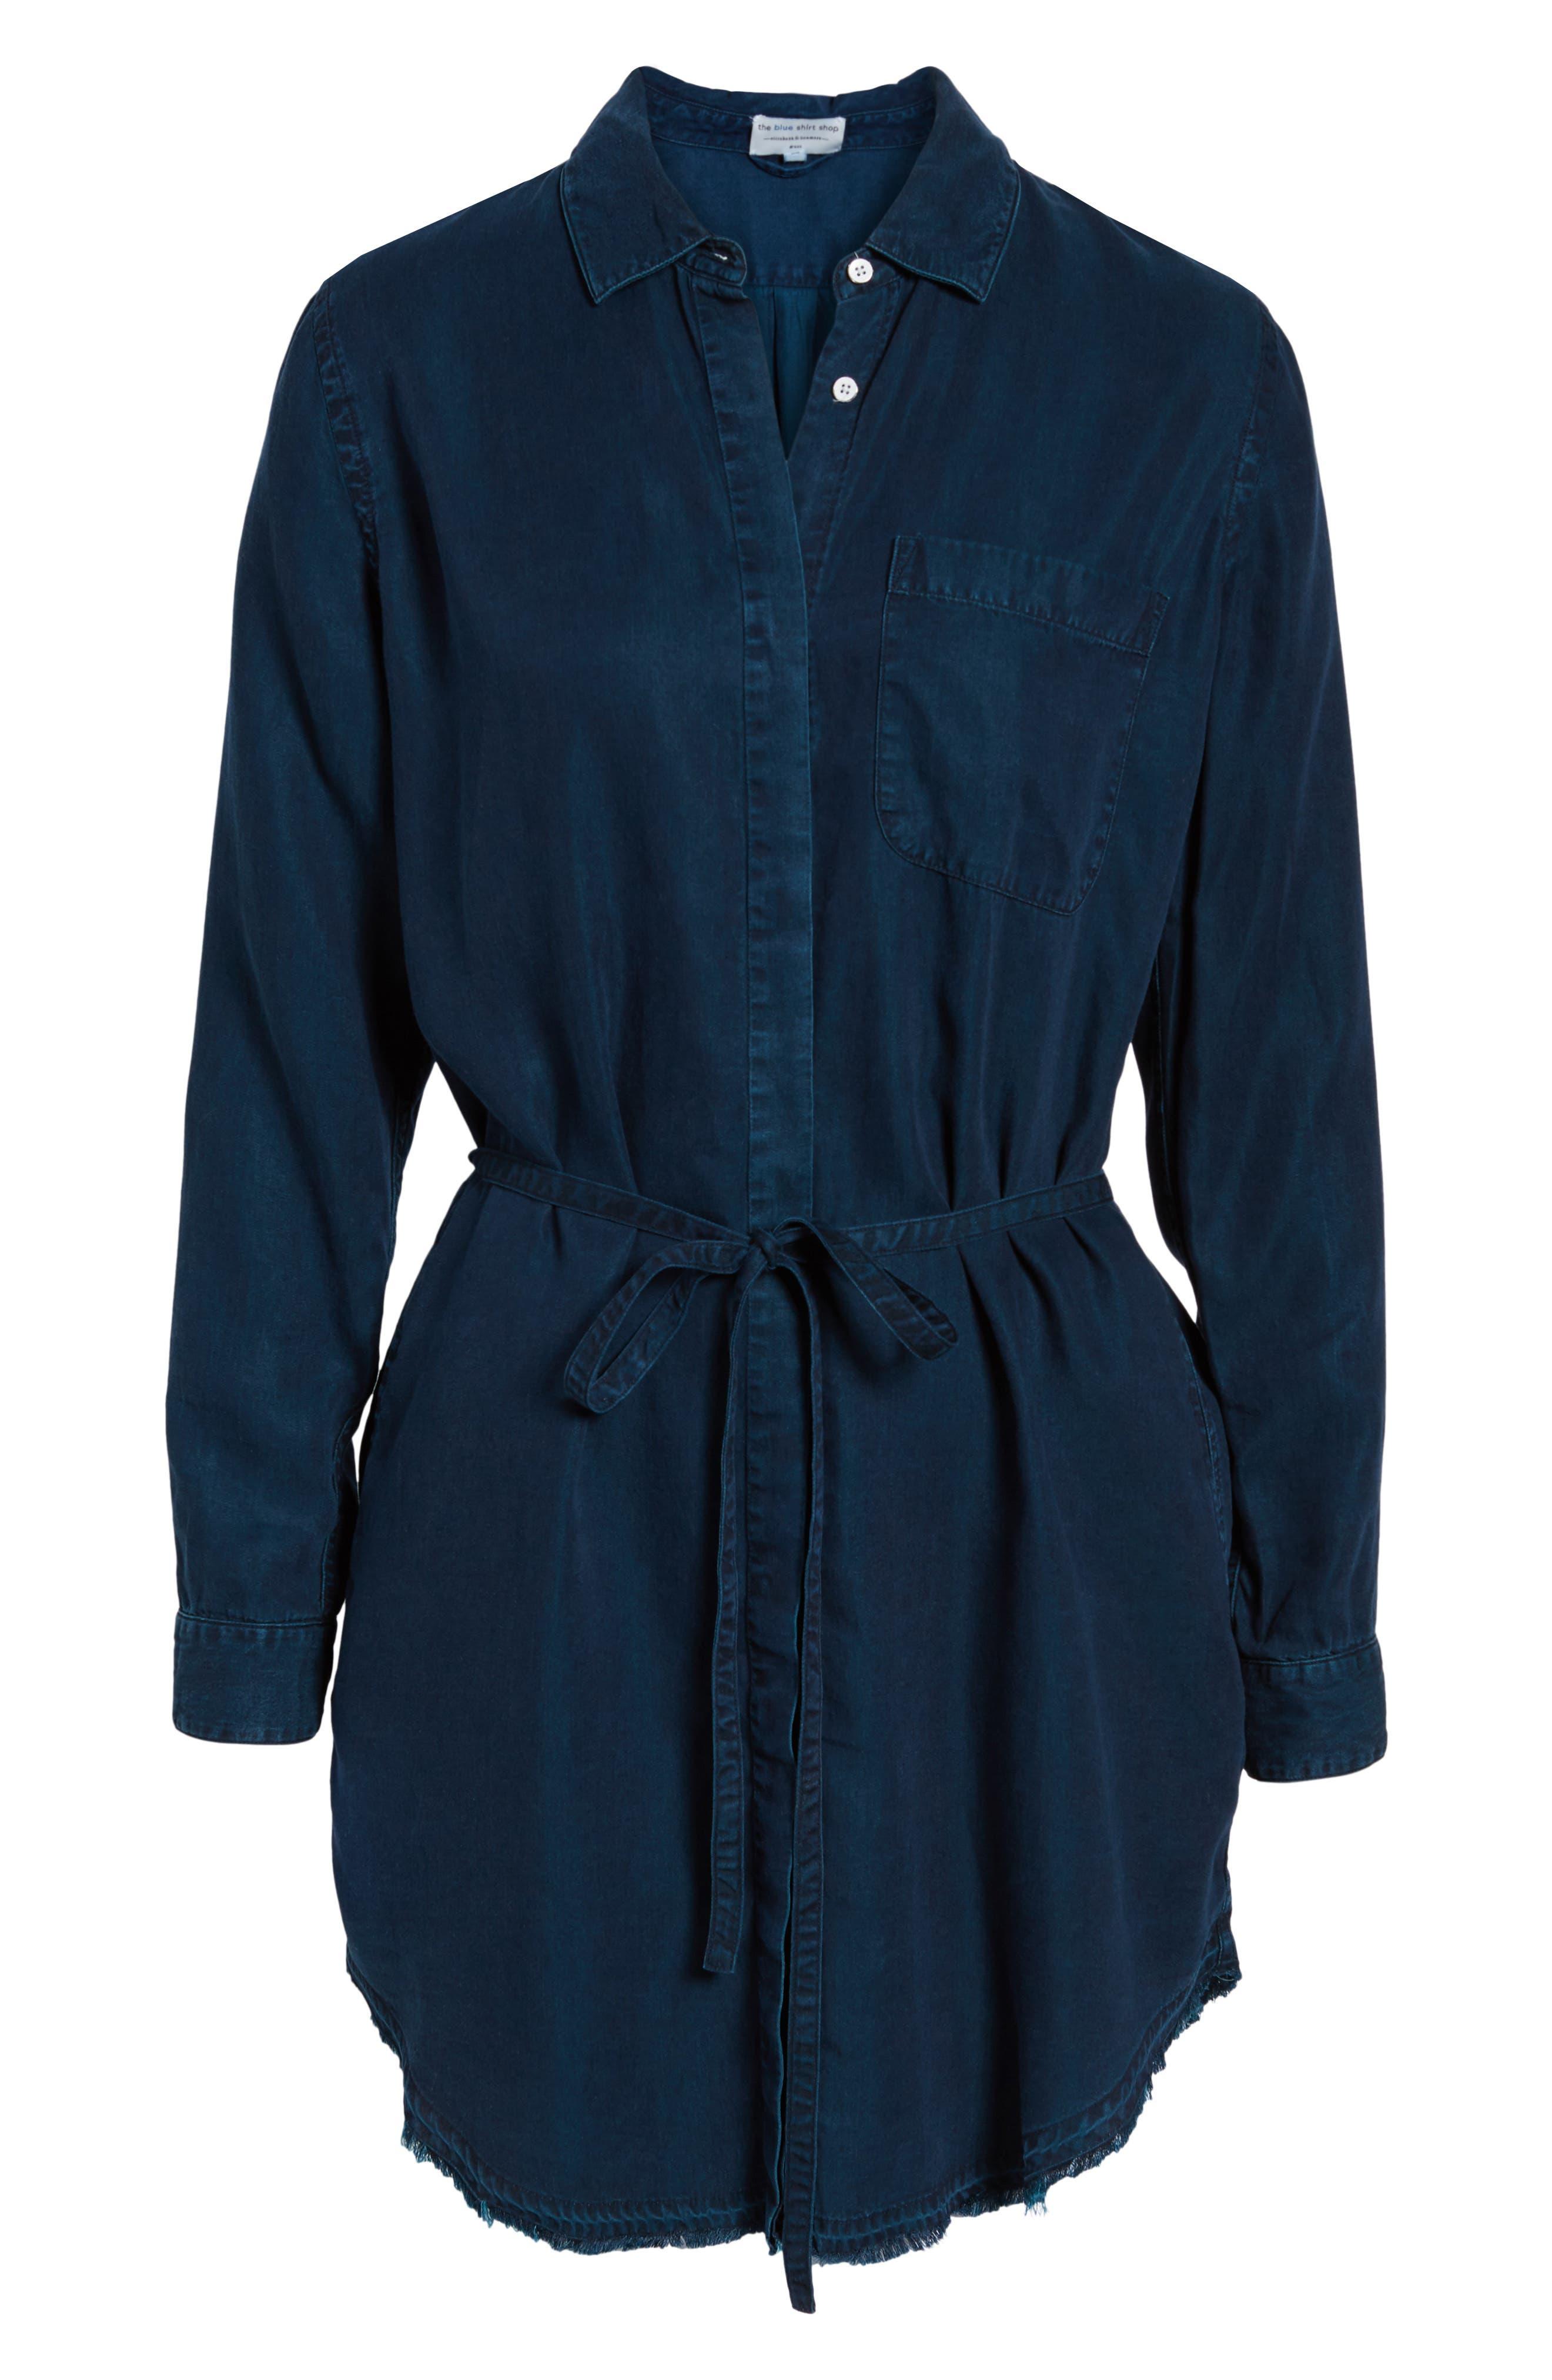 Elizabeth & Kenmare Shirtdress,                             Alternate thumbnail 6, color,                             405